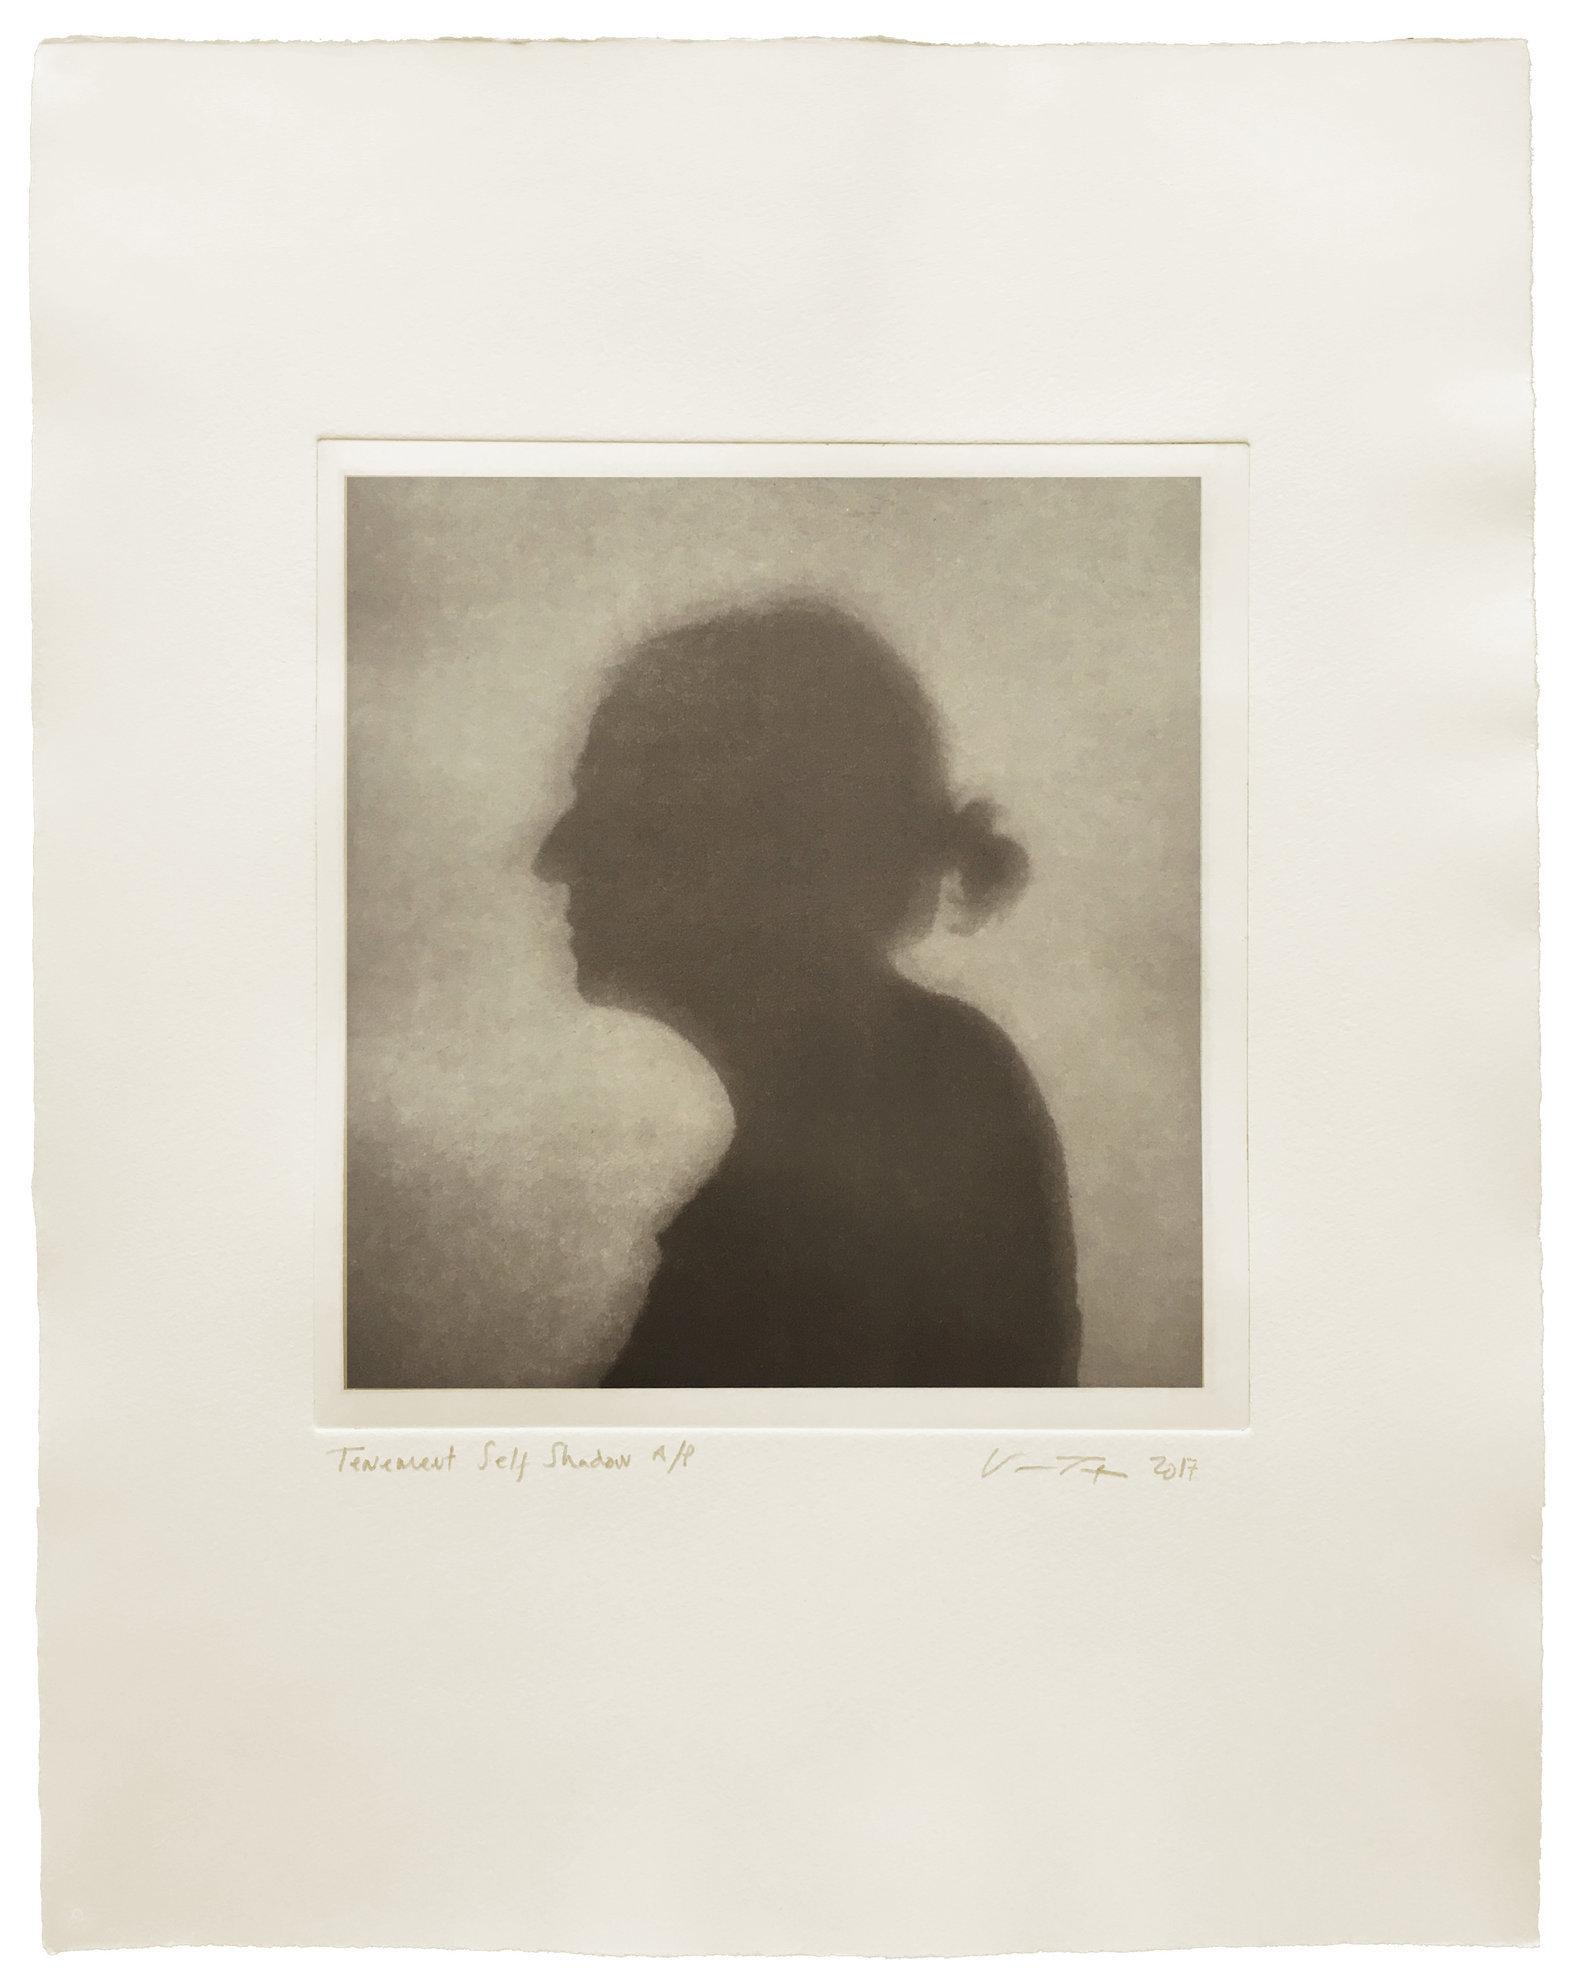 Tenement Self Shadow